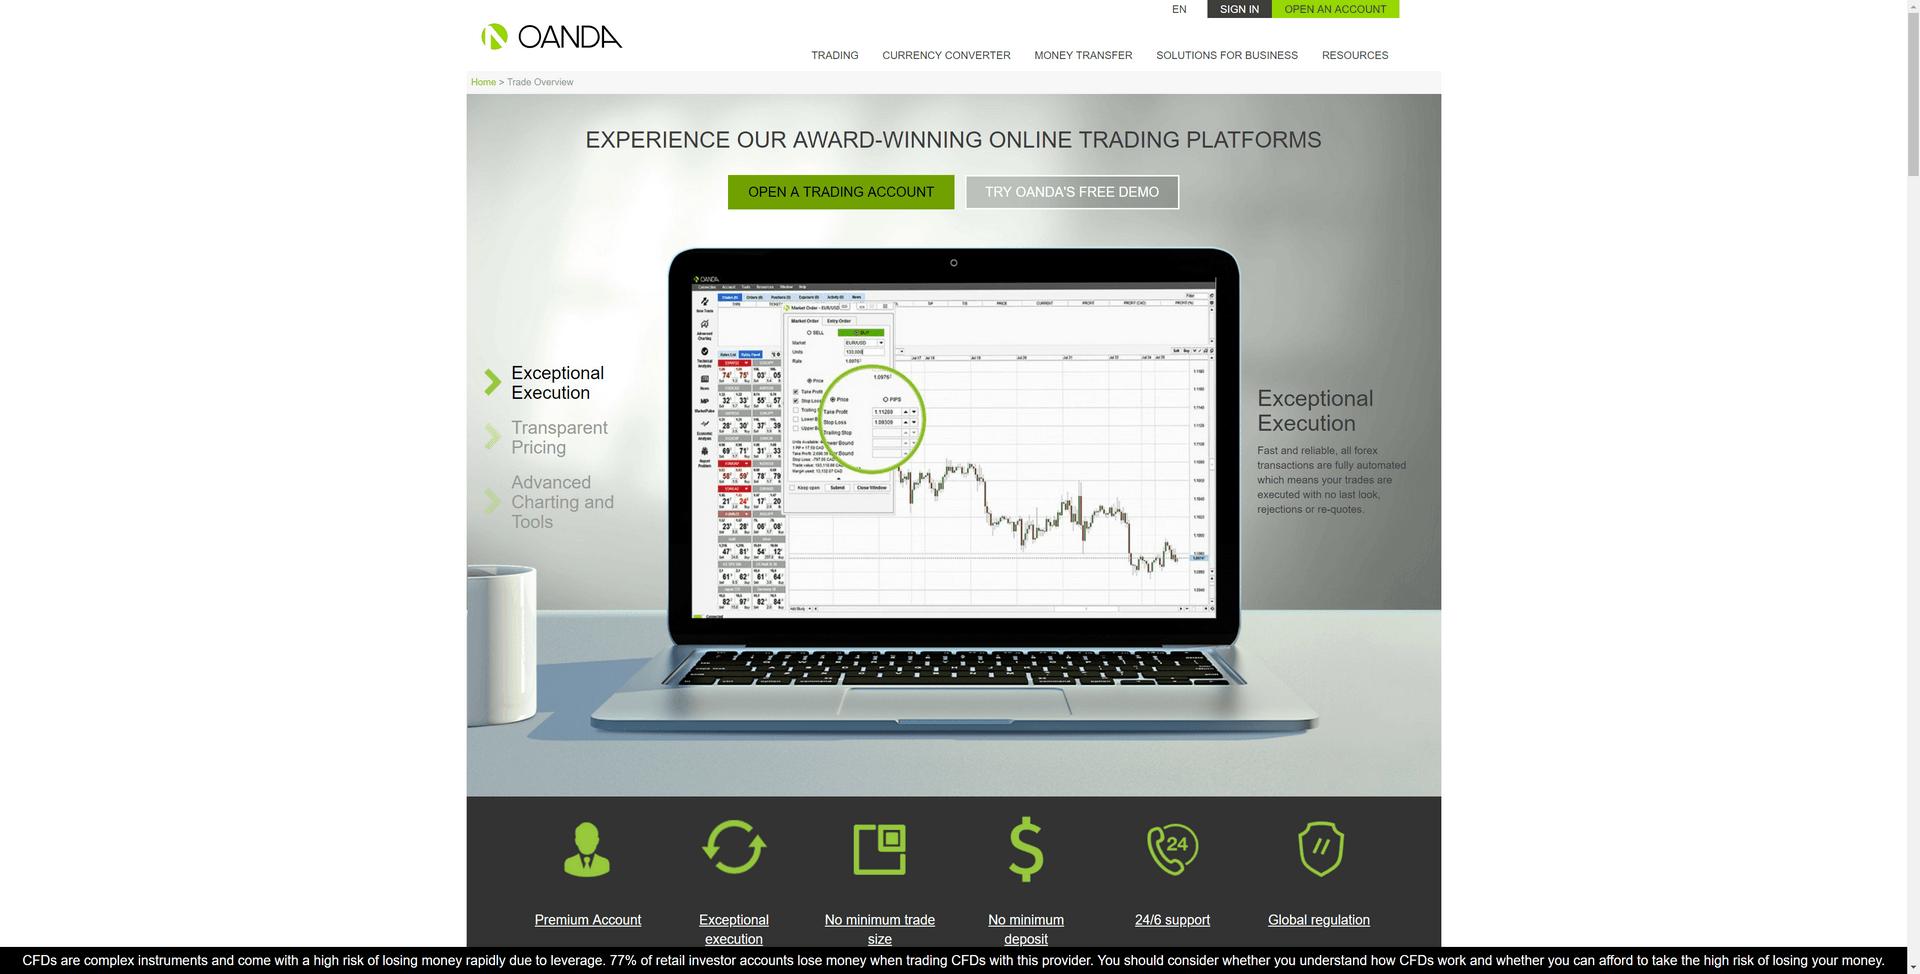 OANDA Review2019 - Scam Broker? + Demo & Bonus Info!